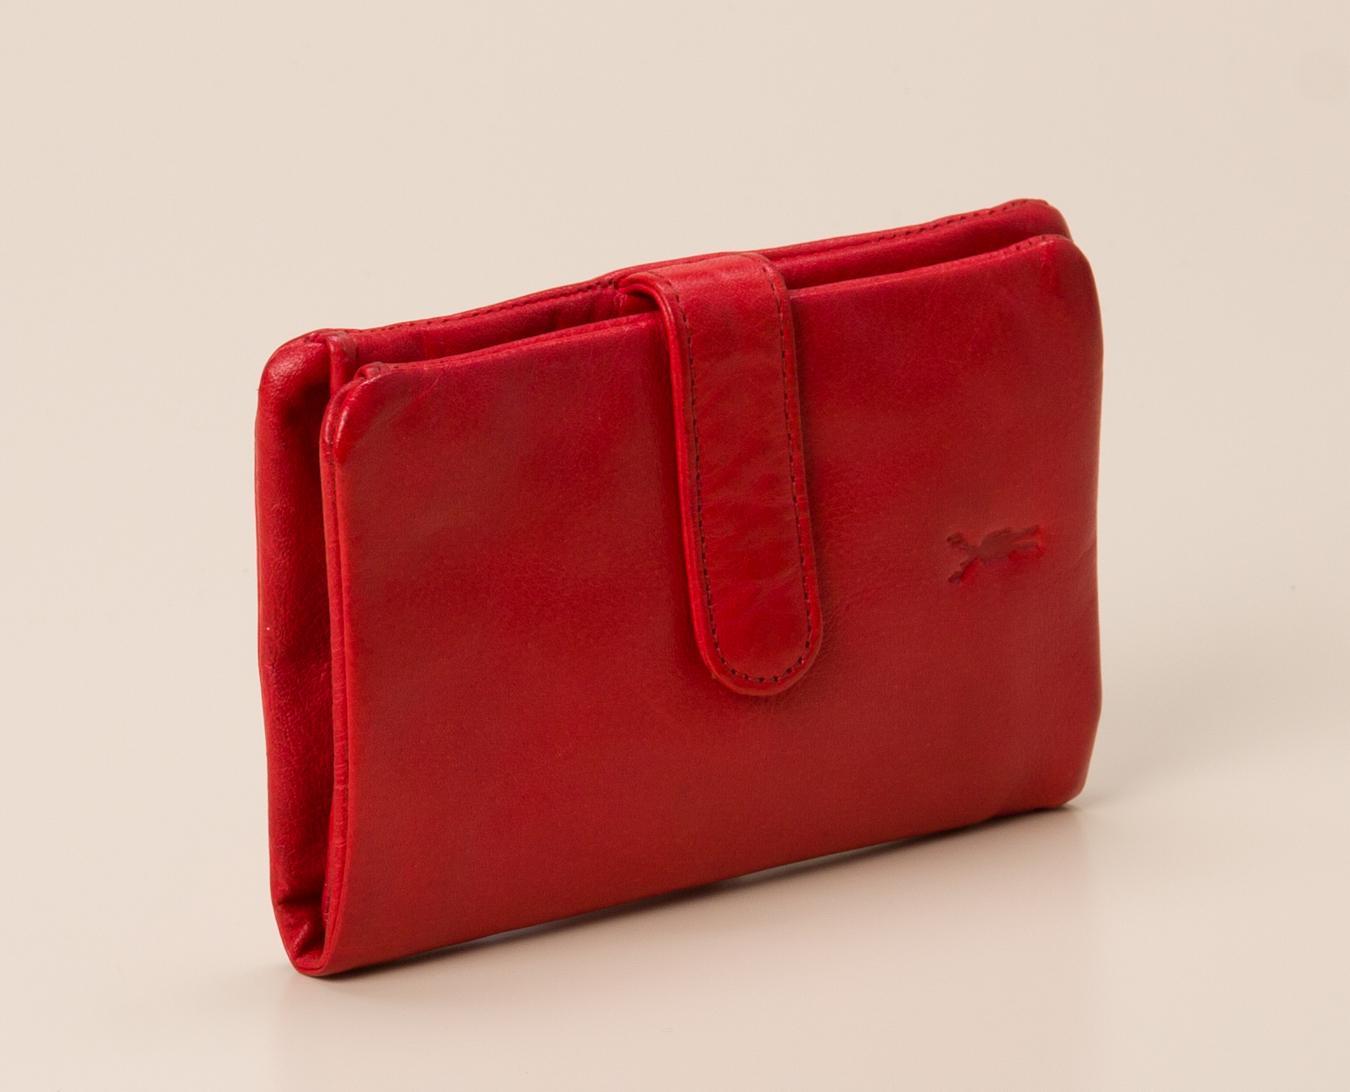 8d942f6857ae1 Jack Kinsky Damen-Acces. Portemonnaie in rot kaufen